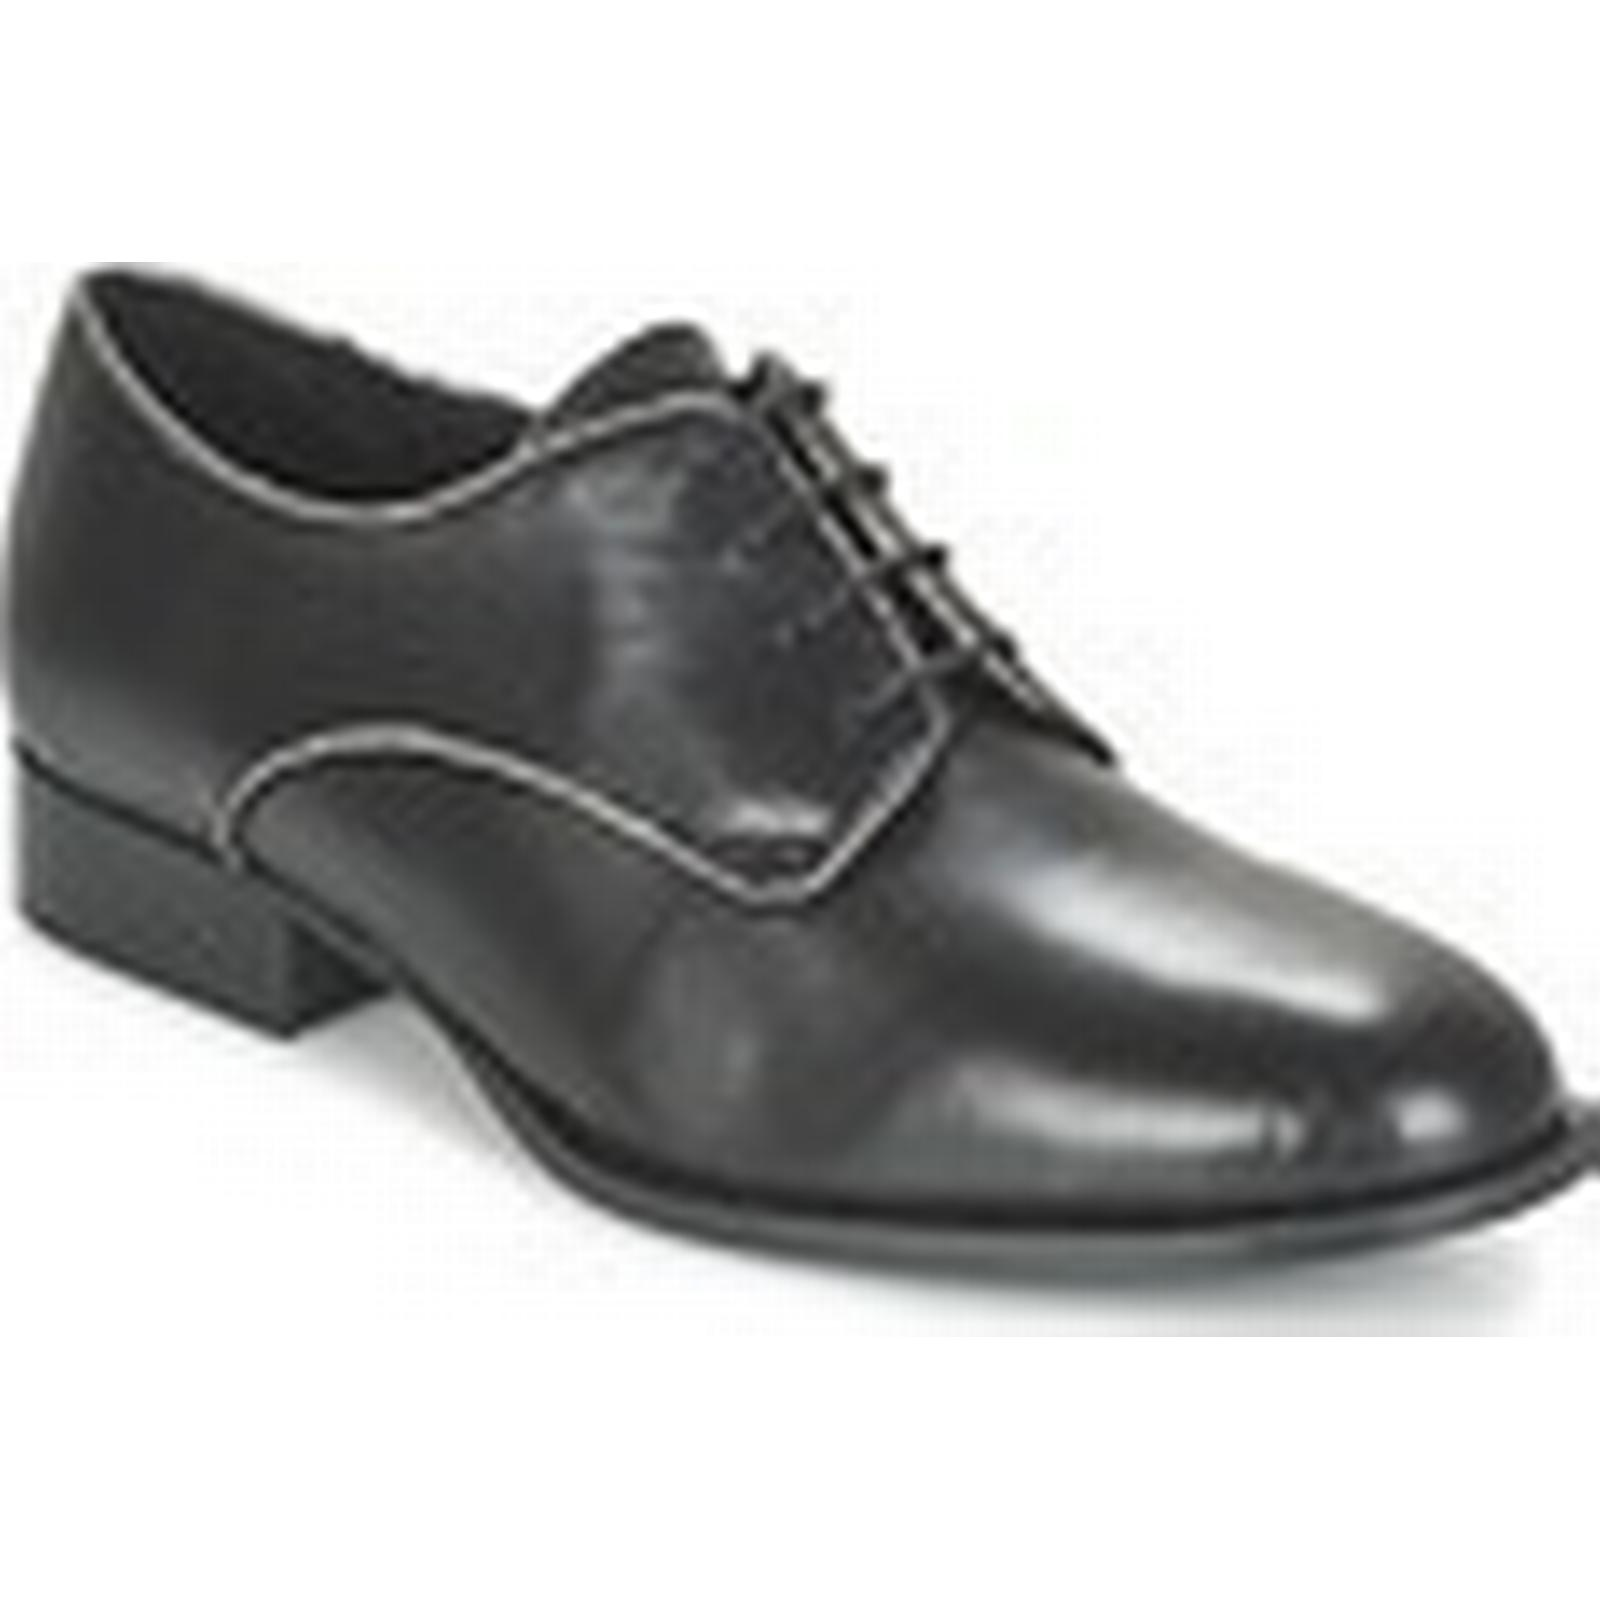 betty londres floje femmes # & # femmes  27; s souliers noirs cbdaf8